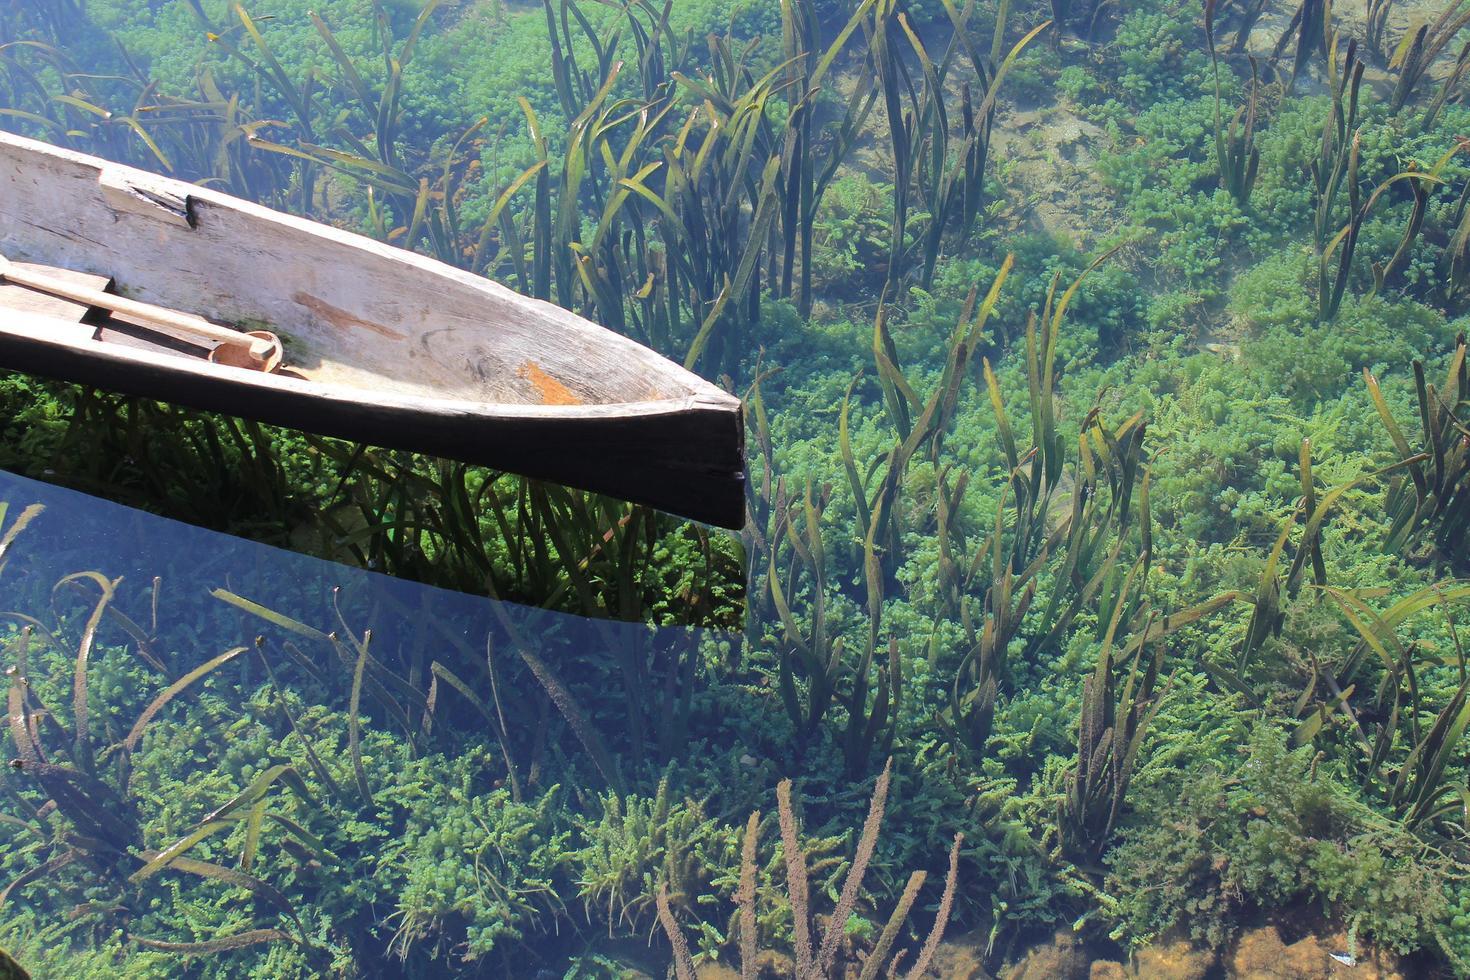 canoa de madera en cuerpo de agua foto